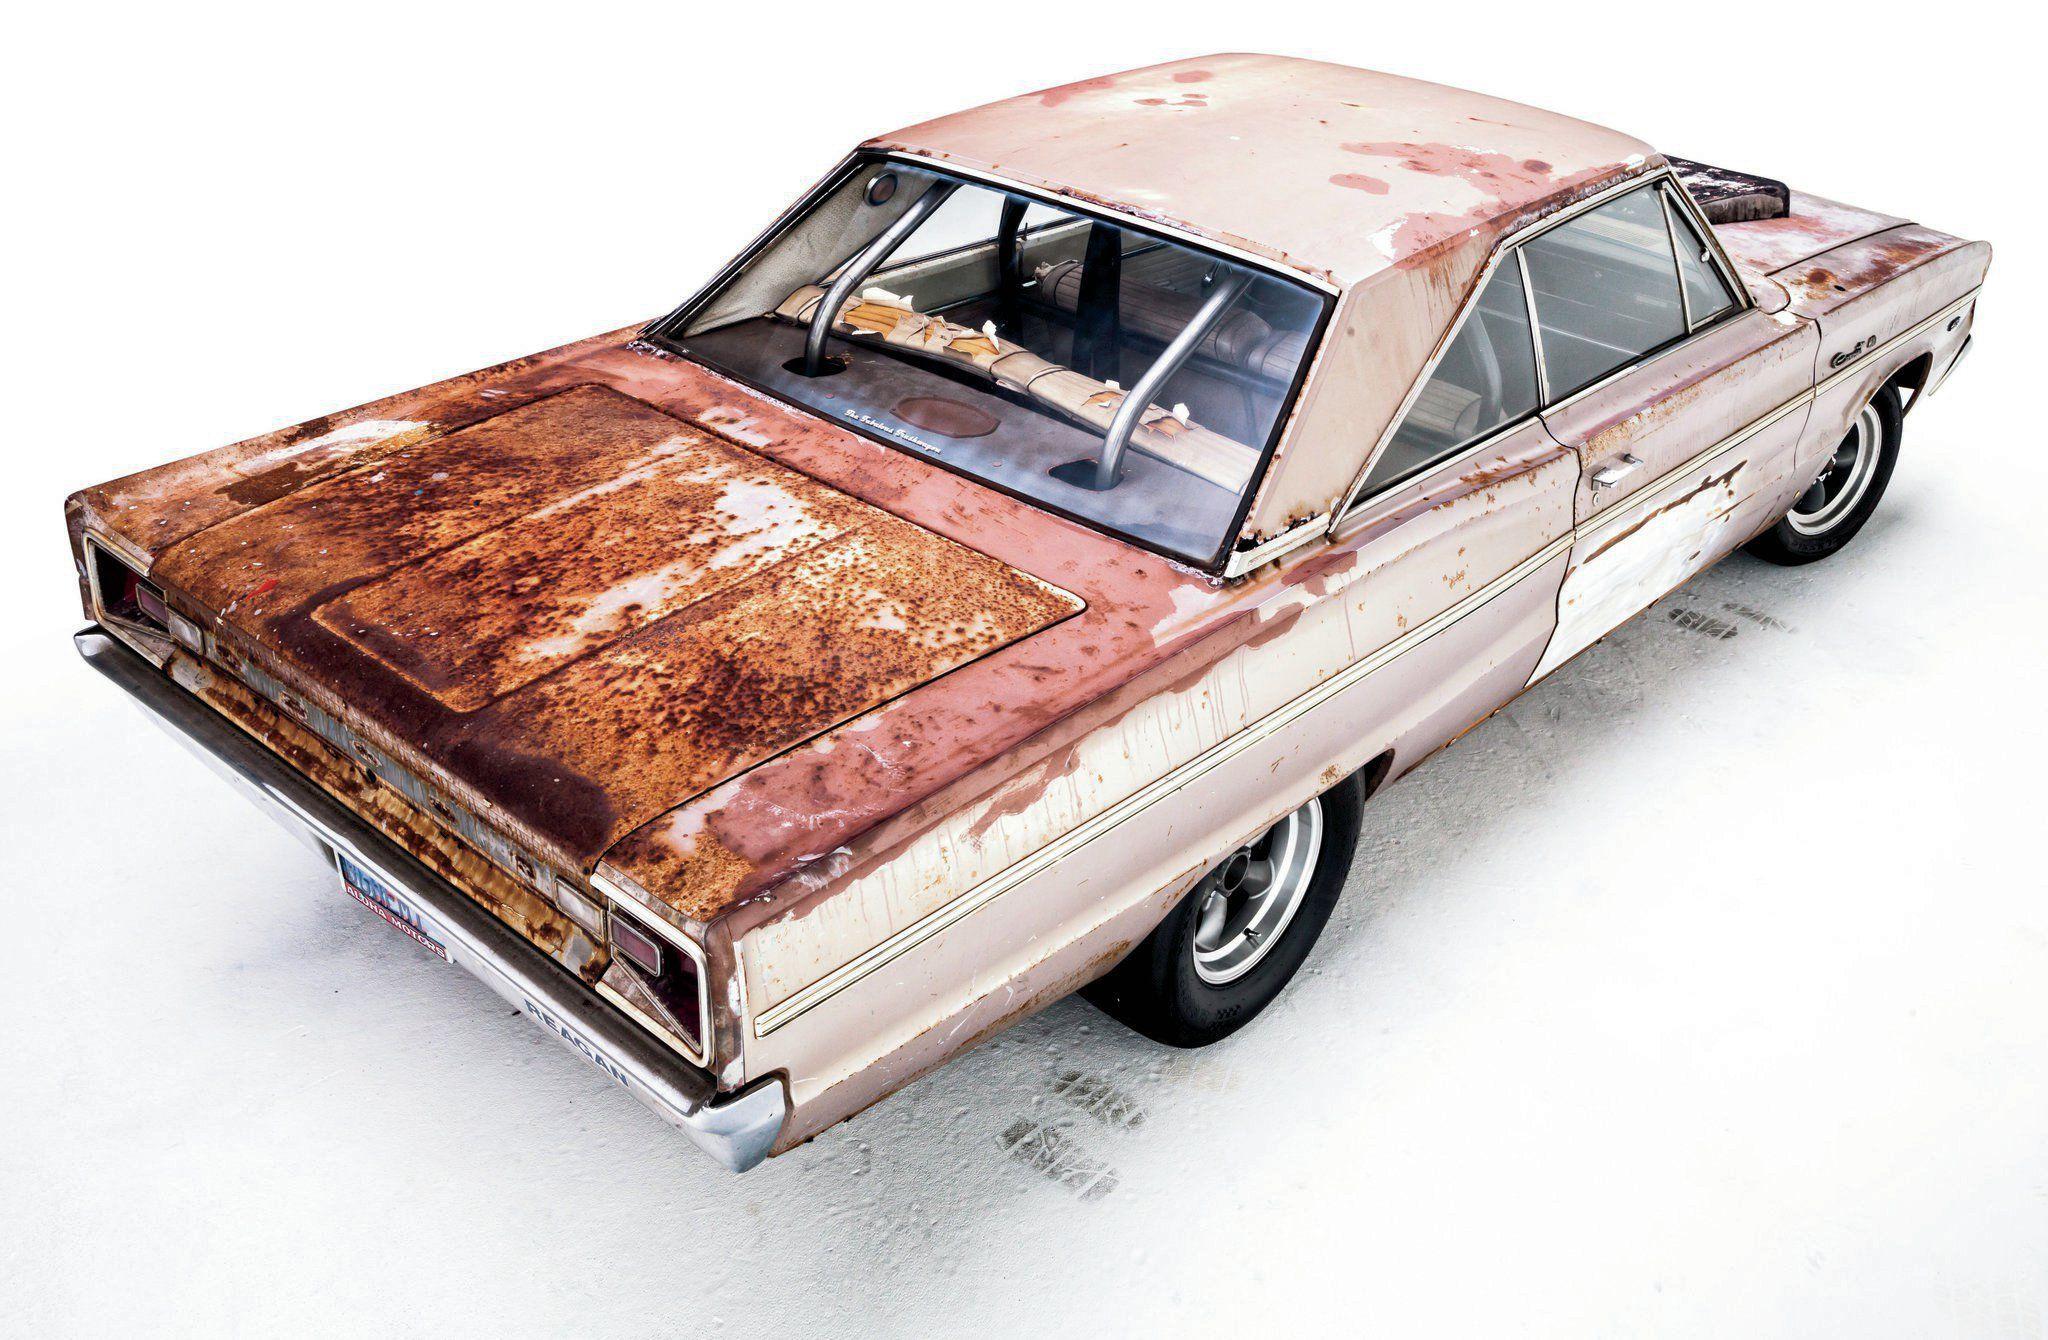 http://www.hotrod.com/cars/featured/1503-1966-dodge-coronet-hard ...